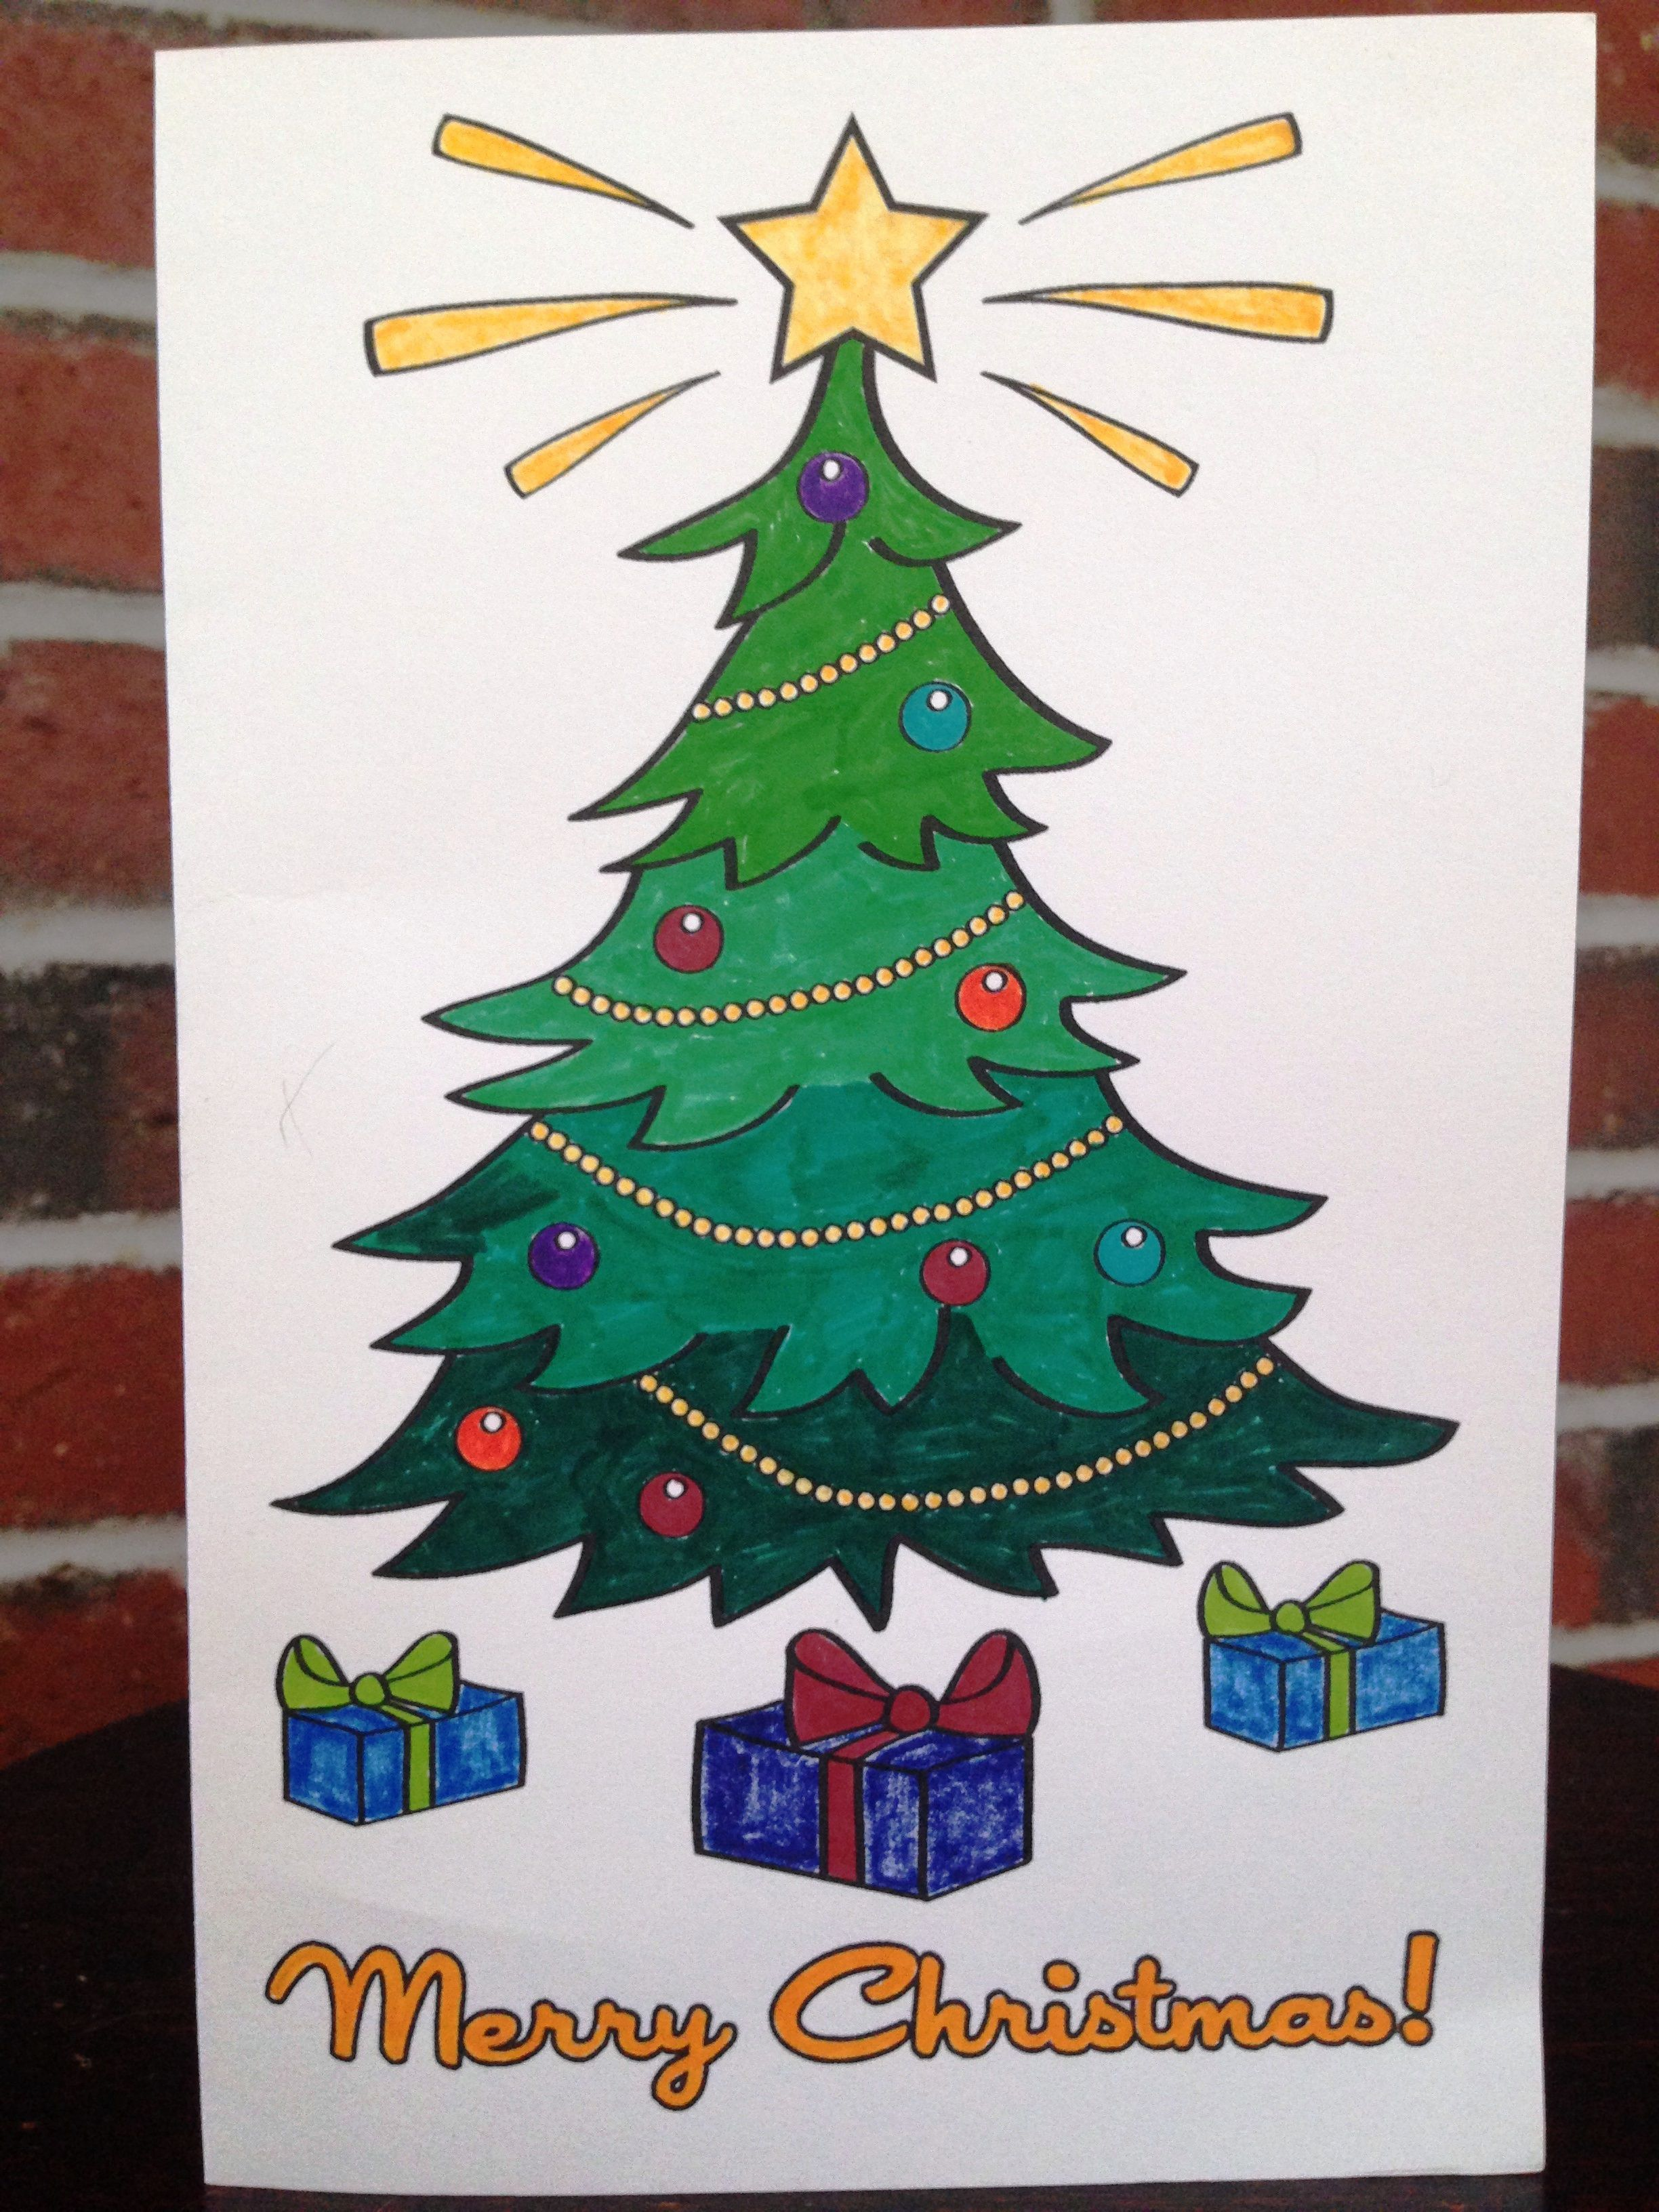 004 Fascinating Free Printable Christma Card Making Template Photo  TemplatesFull